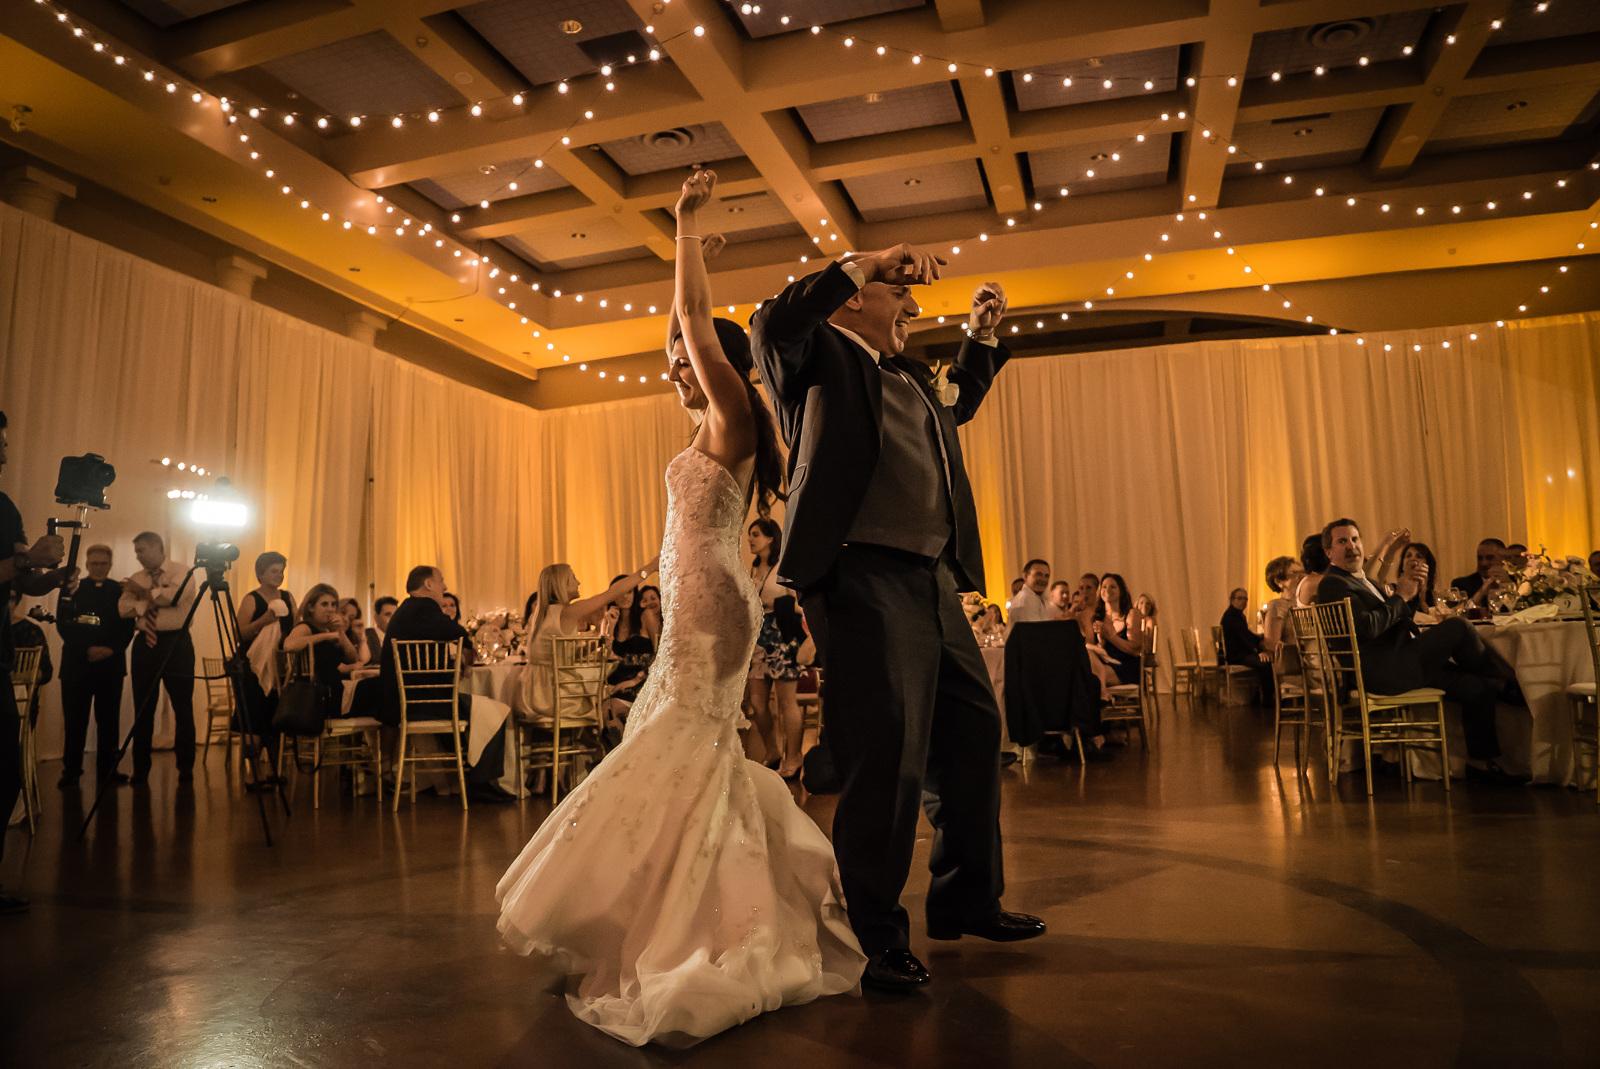 Wedding_Videography_LasVegas_Los_Angeles_San_Diego.jpg